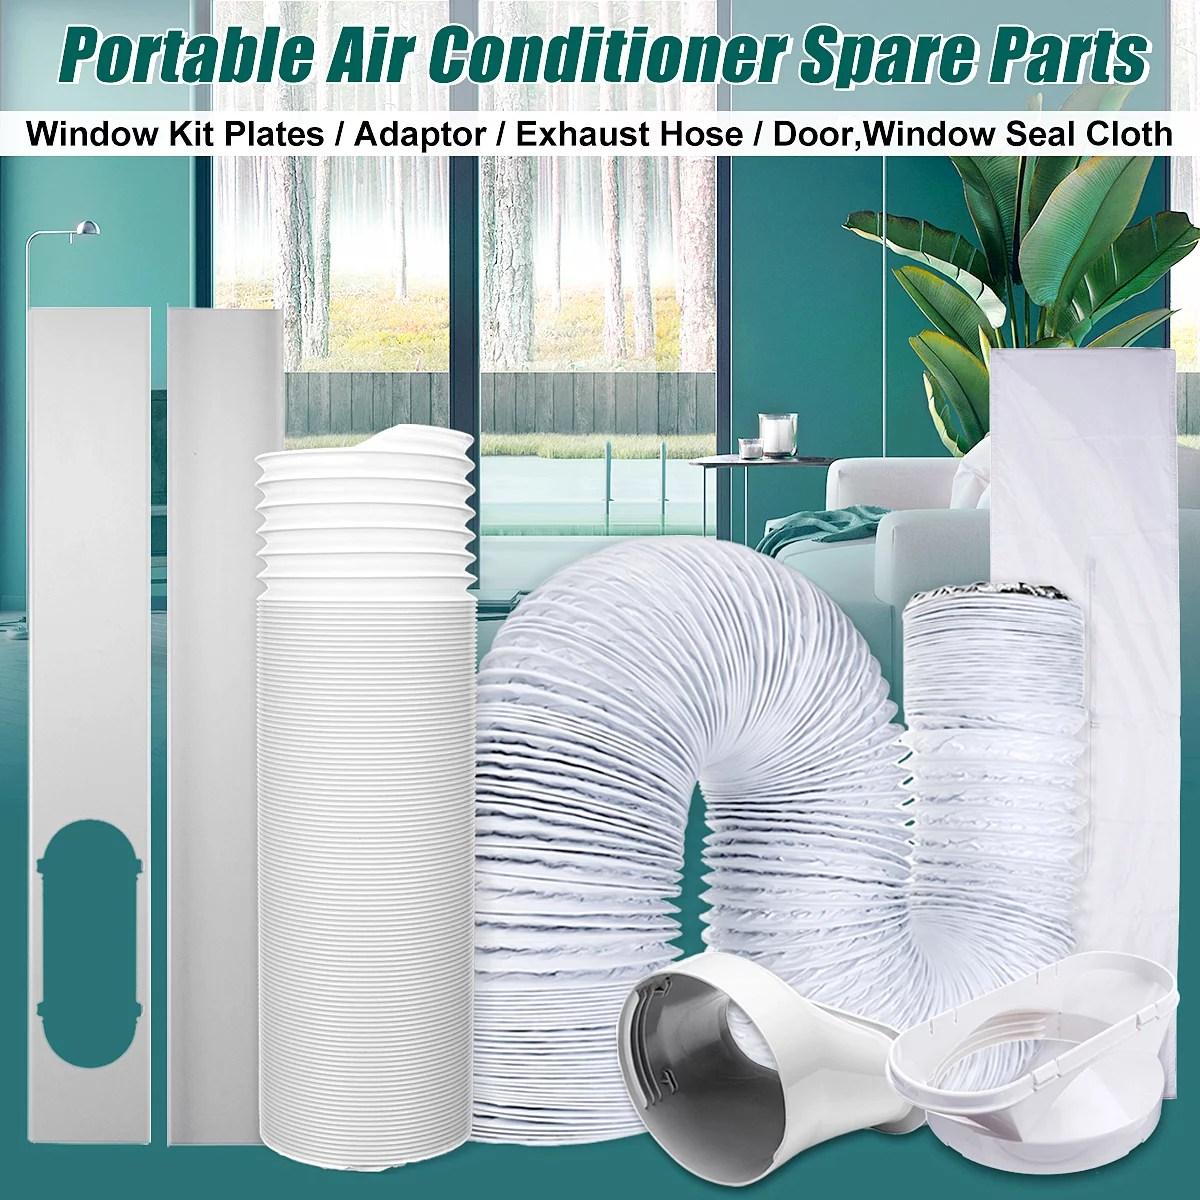 portable air conditioner window vent kit window slide kit plate portable exhaust hose flexible vent hose parts for portable air conditioner